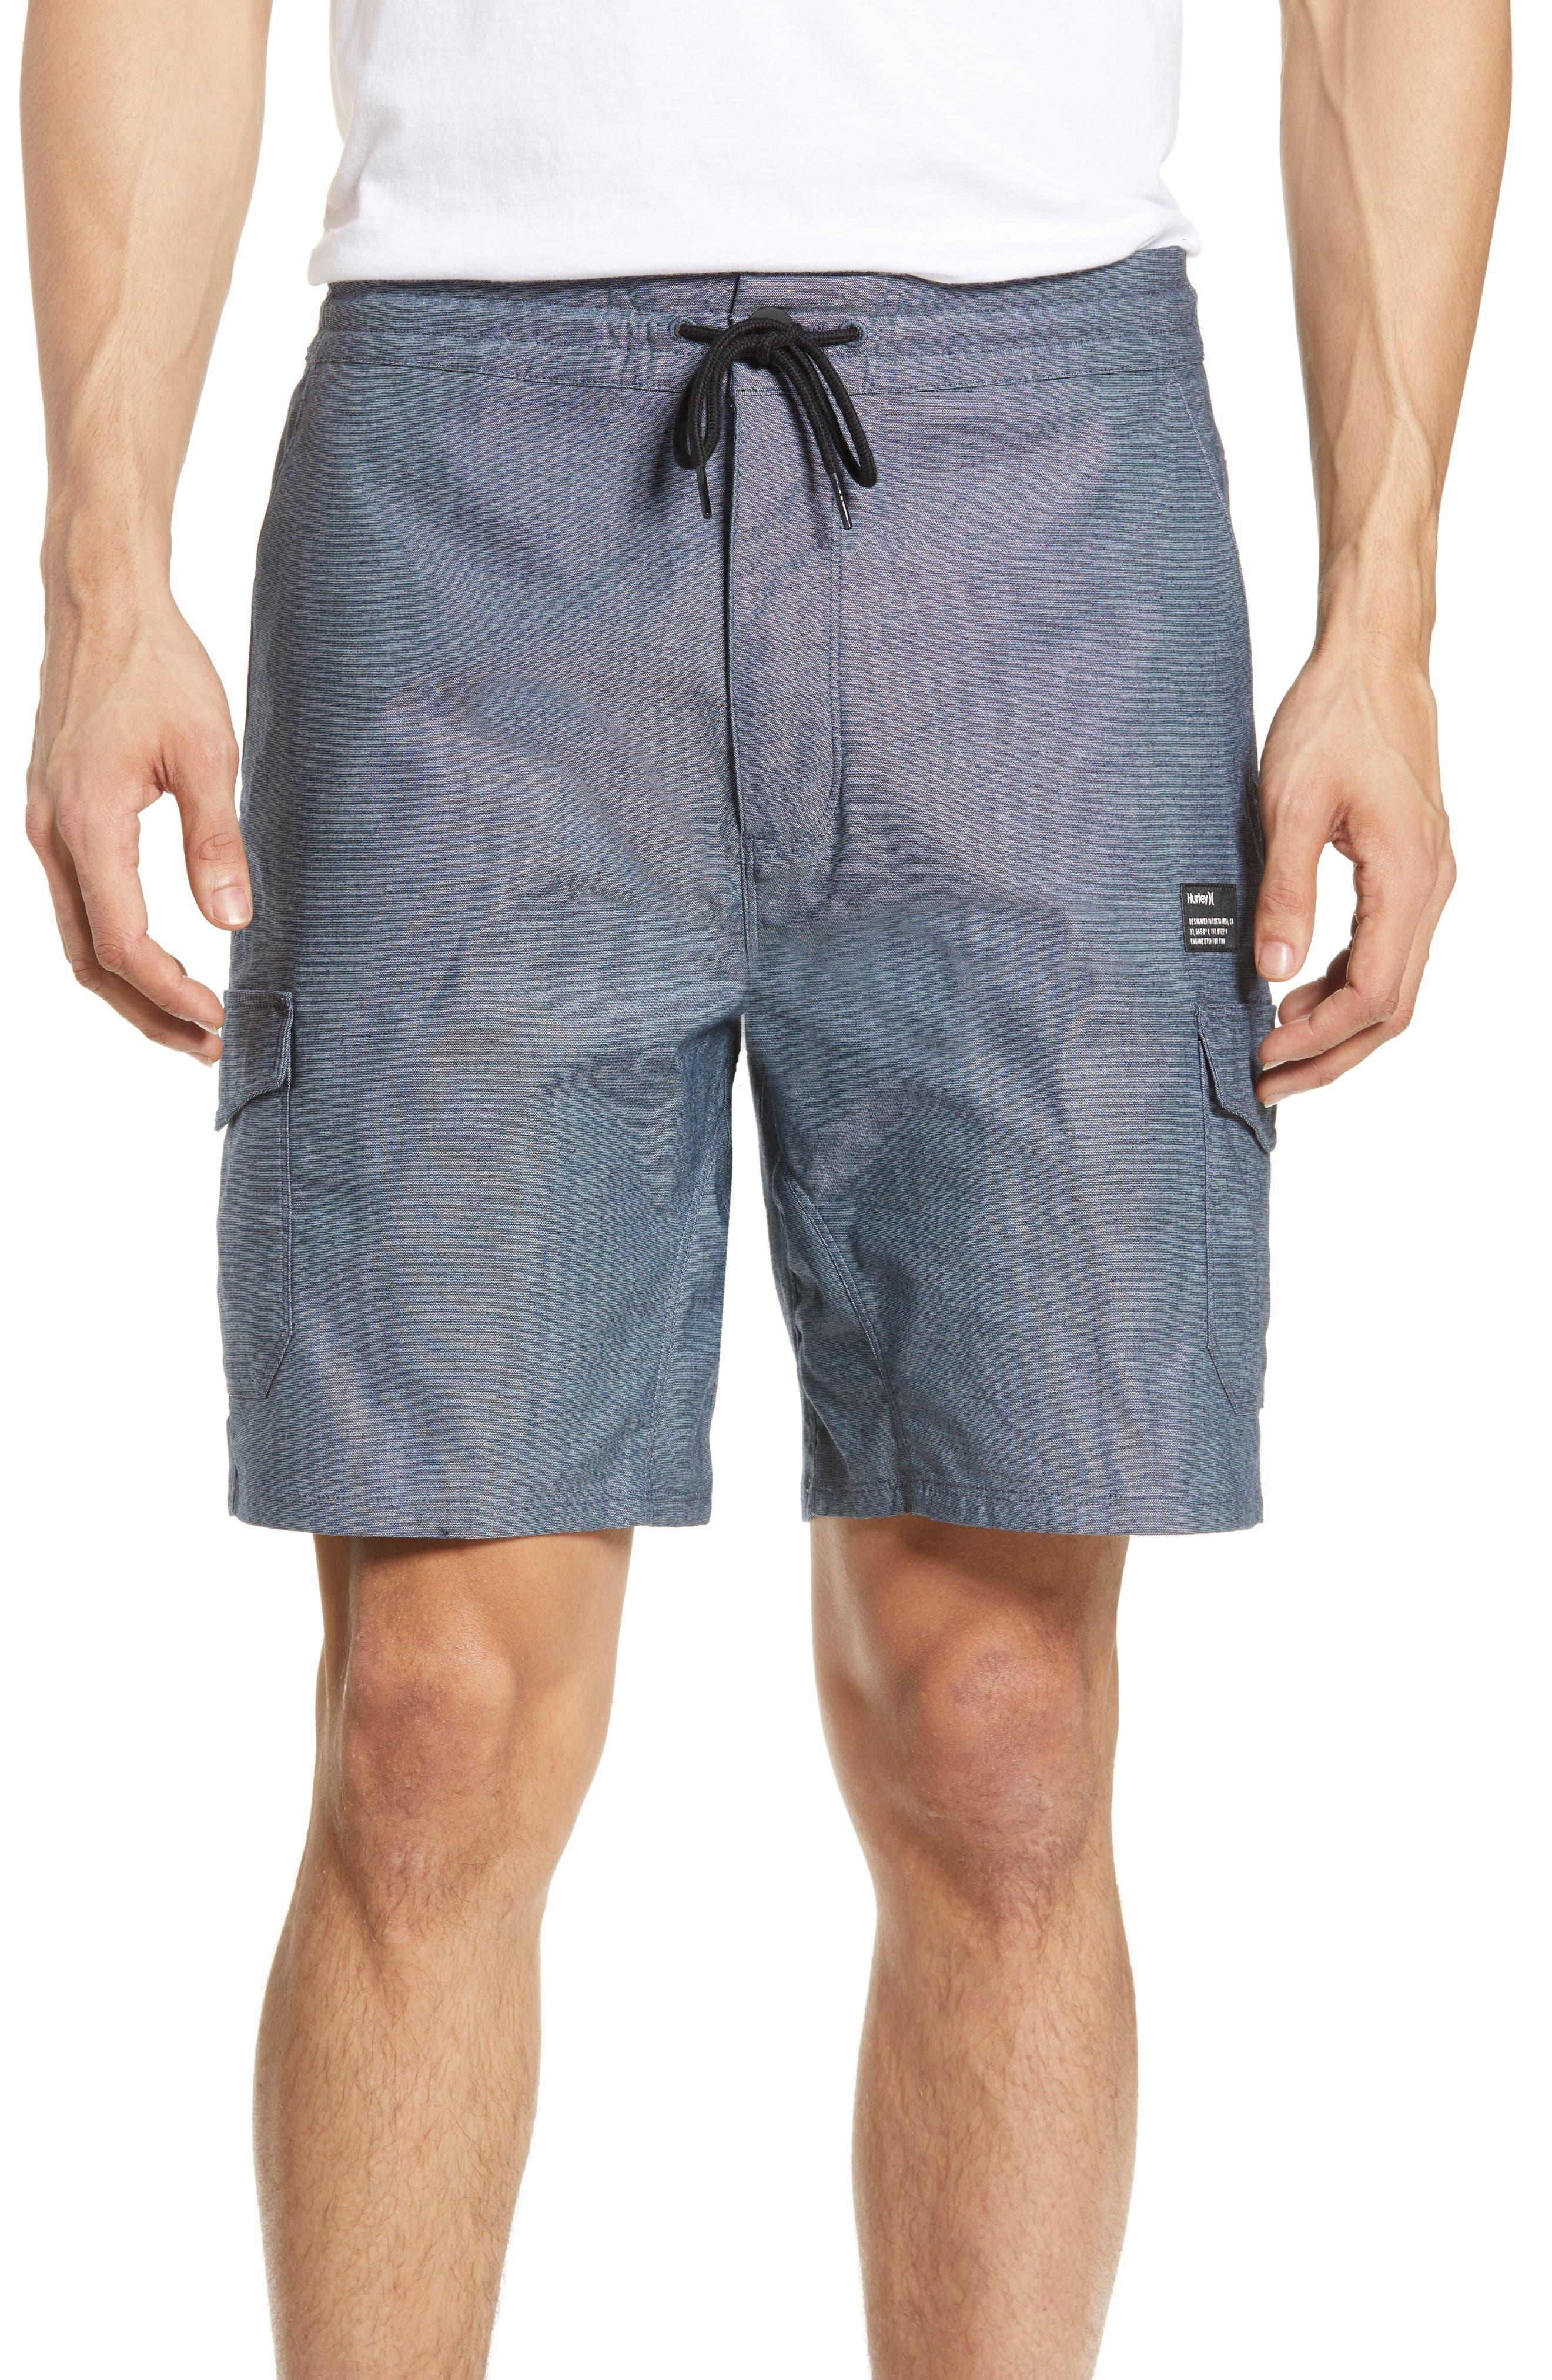 Hurley Dri-Fit Breathe Cargo Shorts, Blue